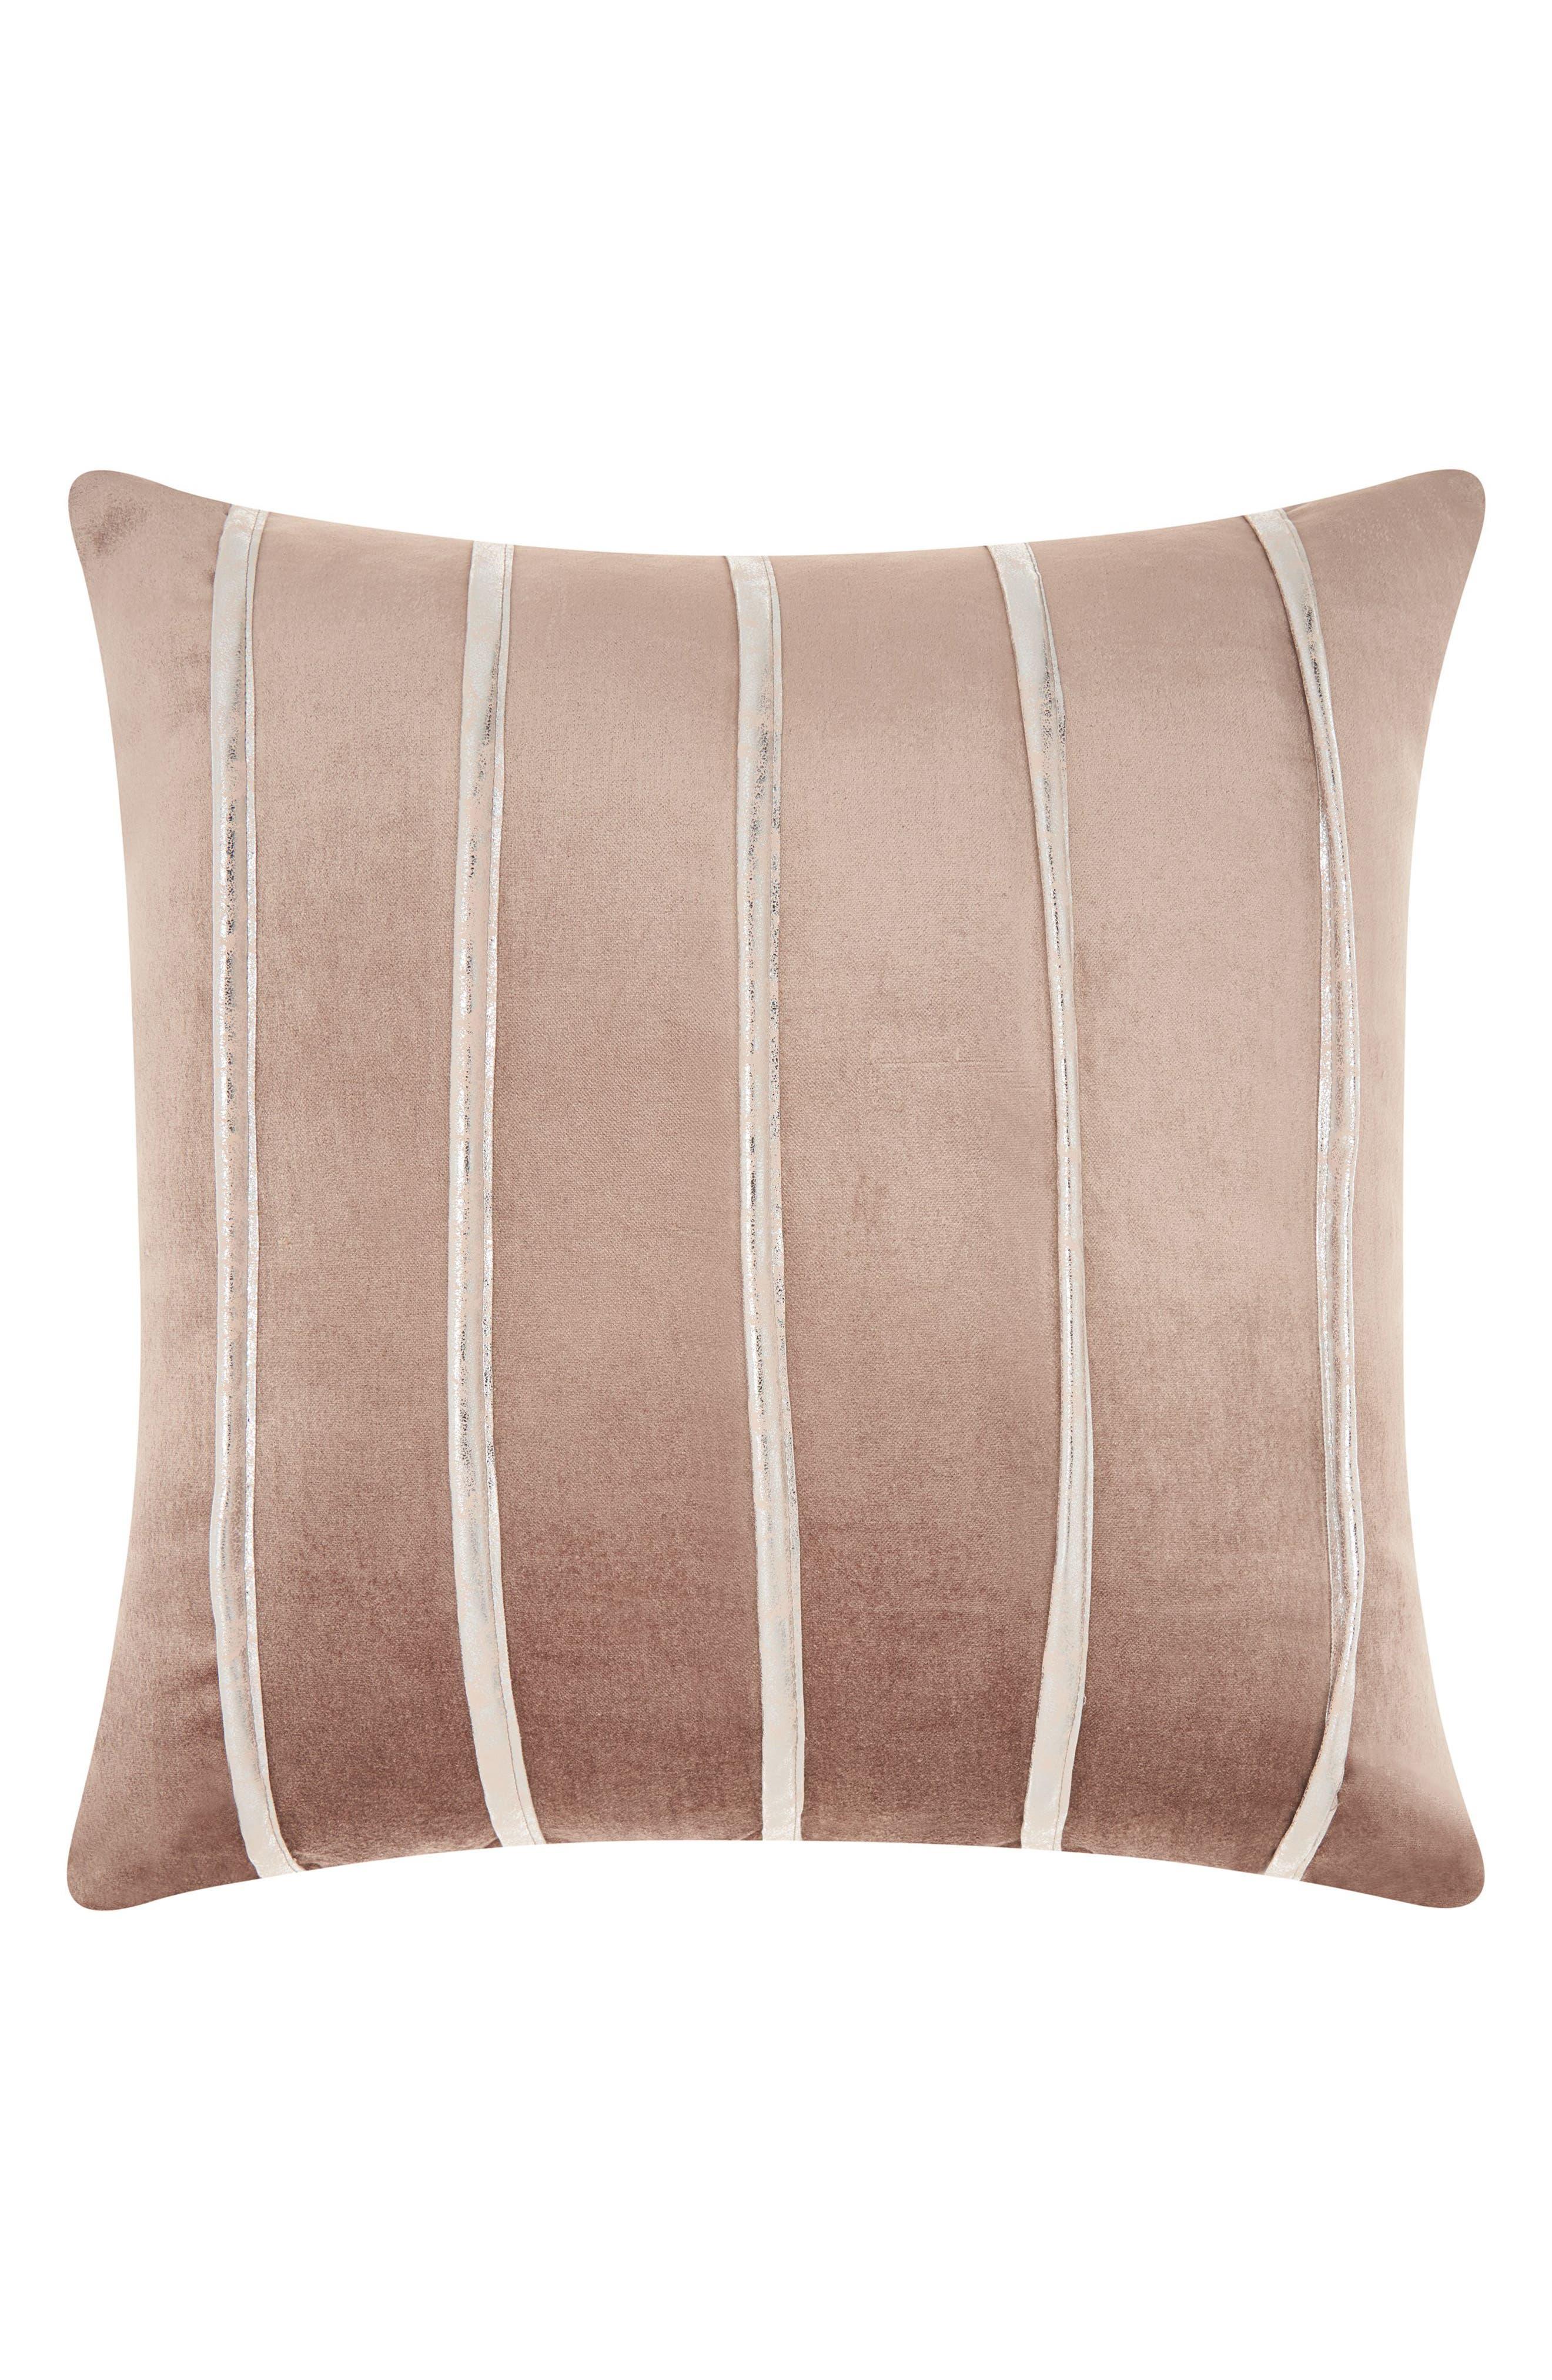 Stripe Velvet Accent Pillow,                             Main thumbnail 1, color,                             250